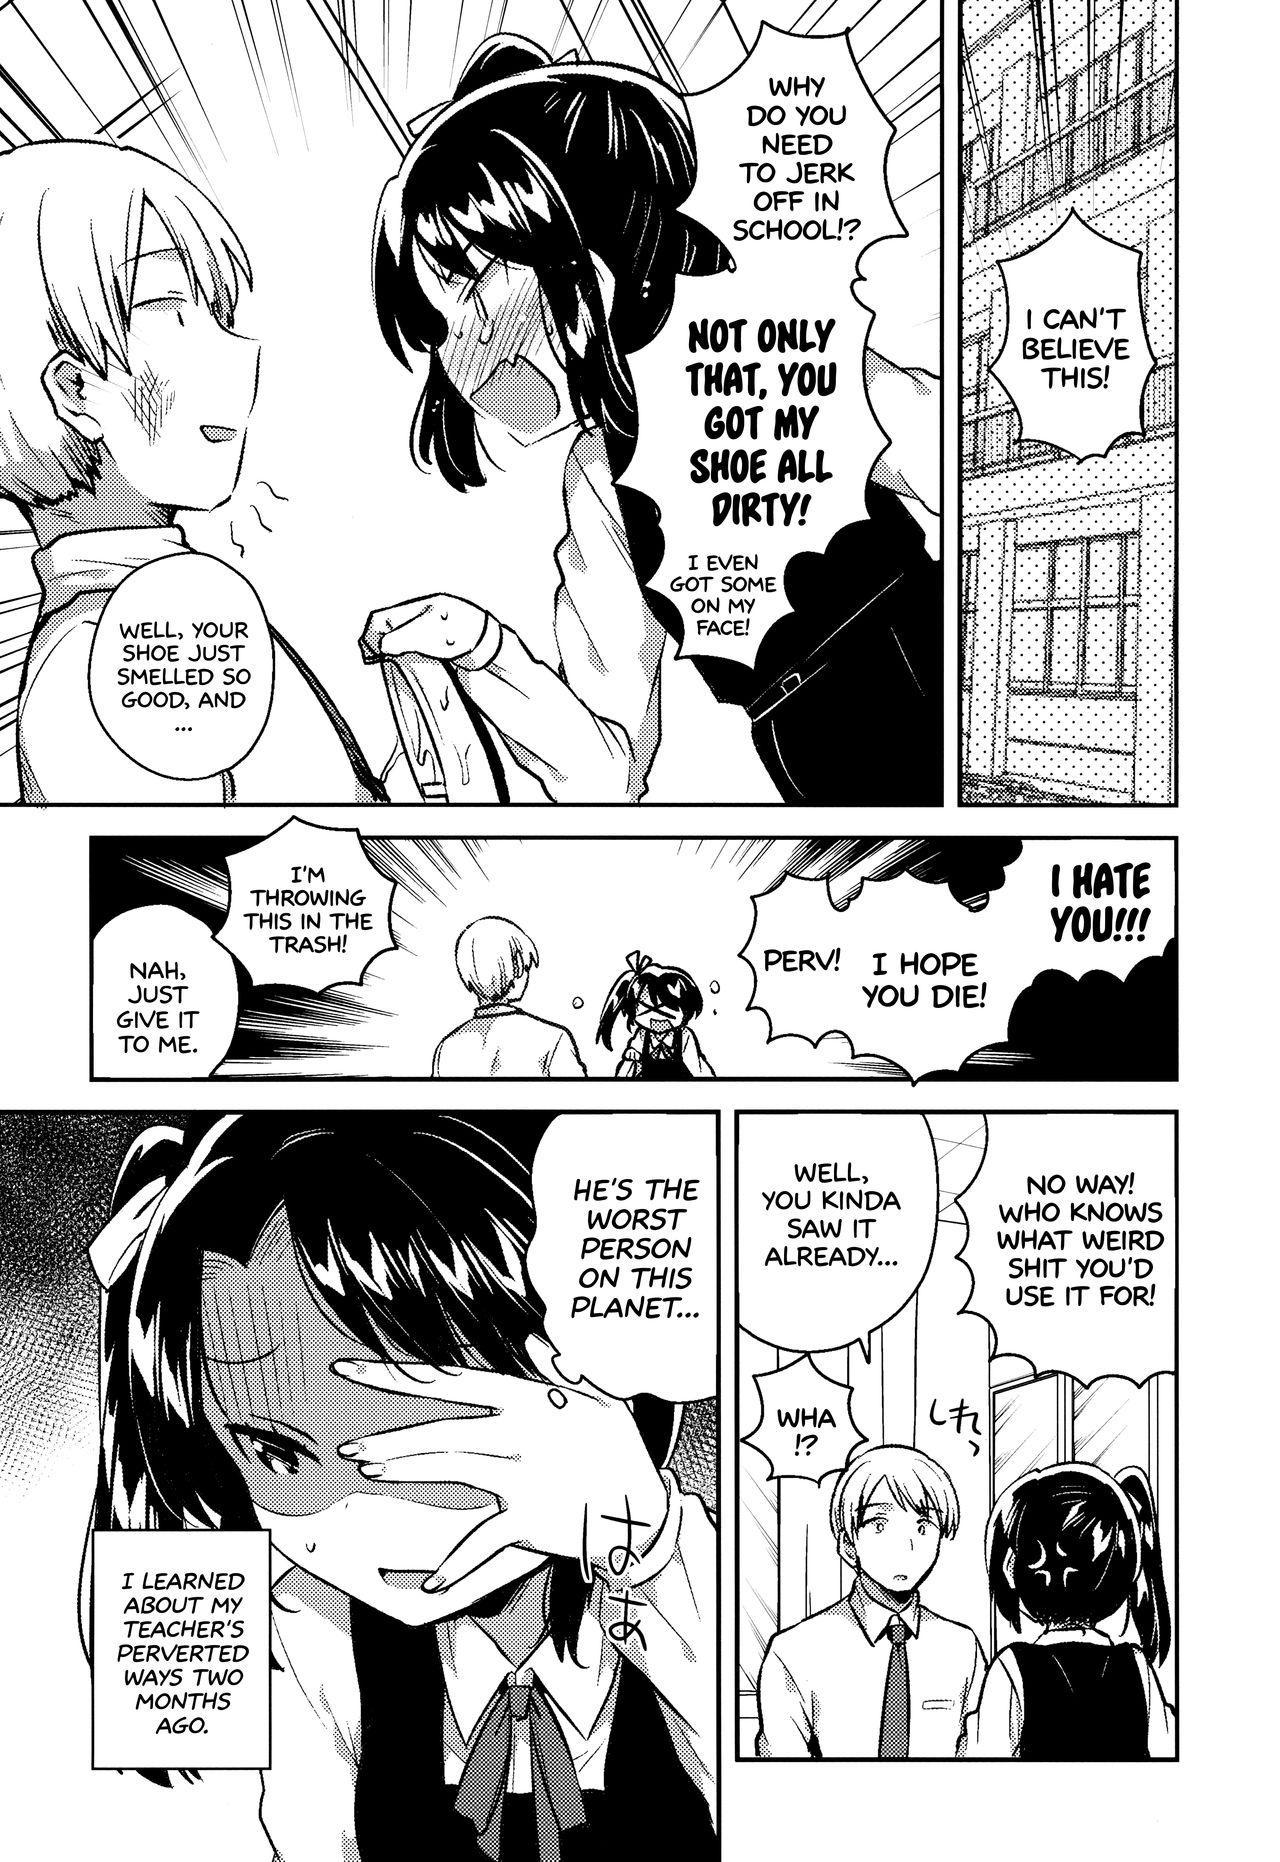 (SC2018 Spring) [squeezecandyheaven (Ichihaya)] Sensei wa Lolicon de Saitei Hentai no Gomikuzu [Zen] + Omake   My Teacher is a Perverted Pedophile Shithead and I Hate Him (First Half) + Bonus Story [English] [ATF] 4